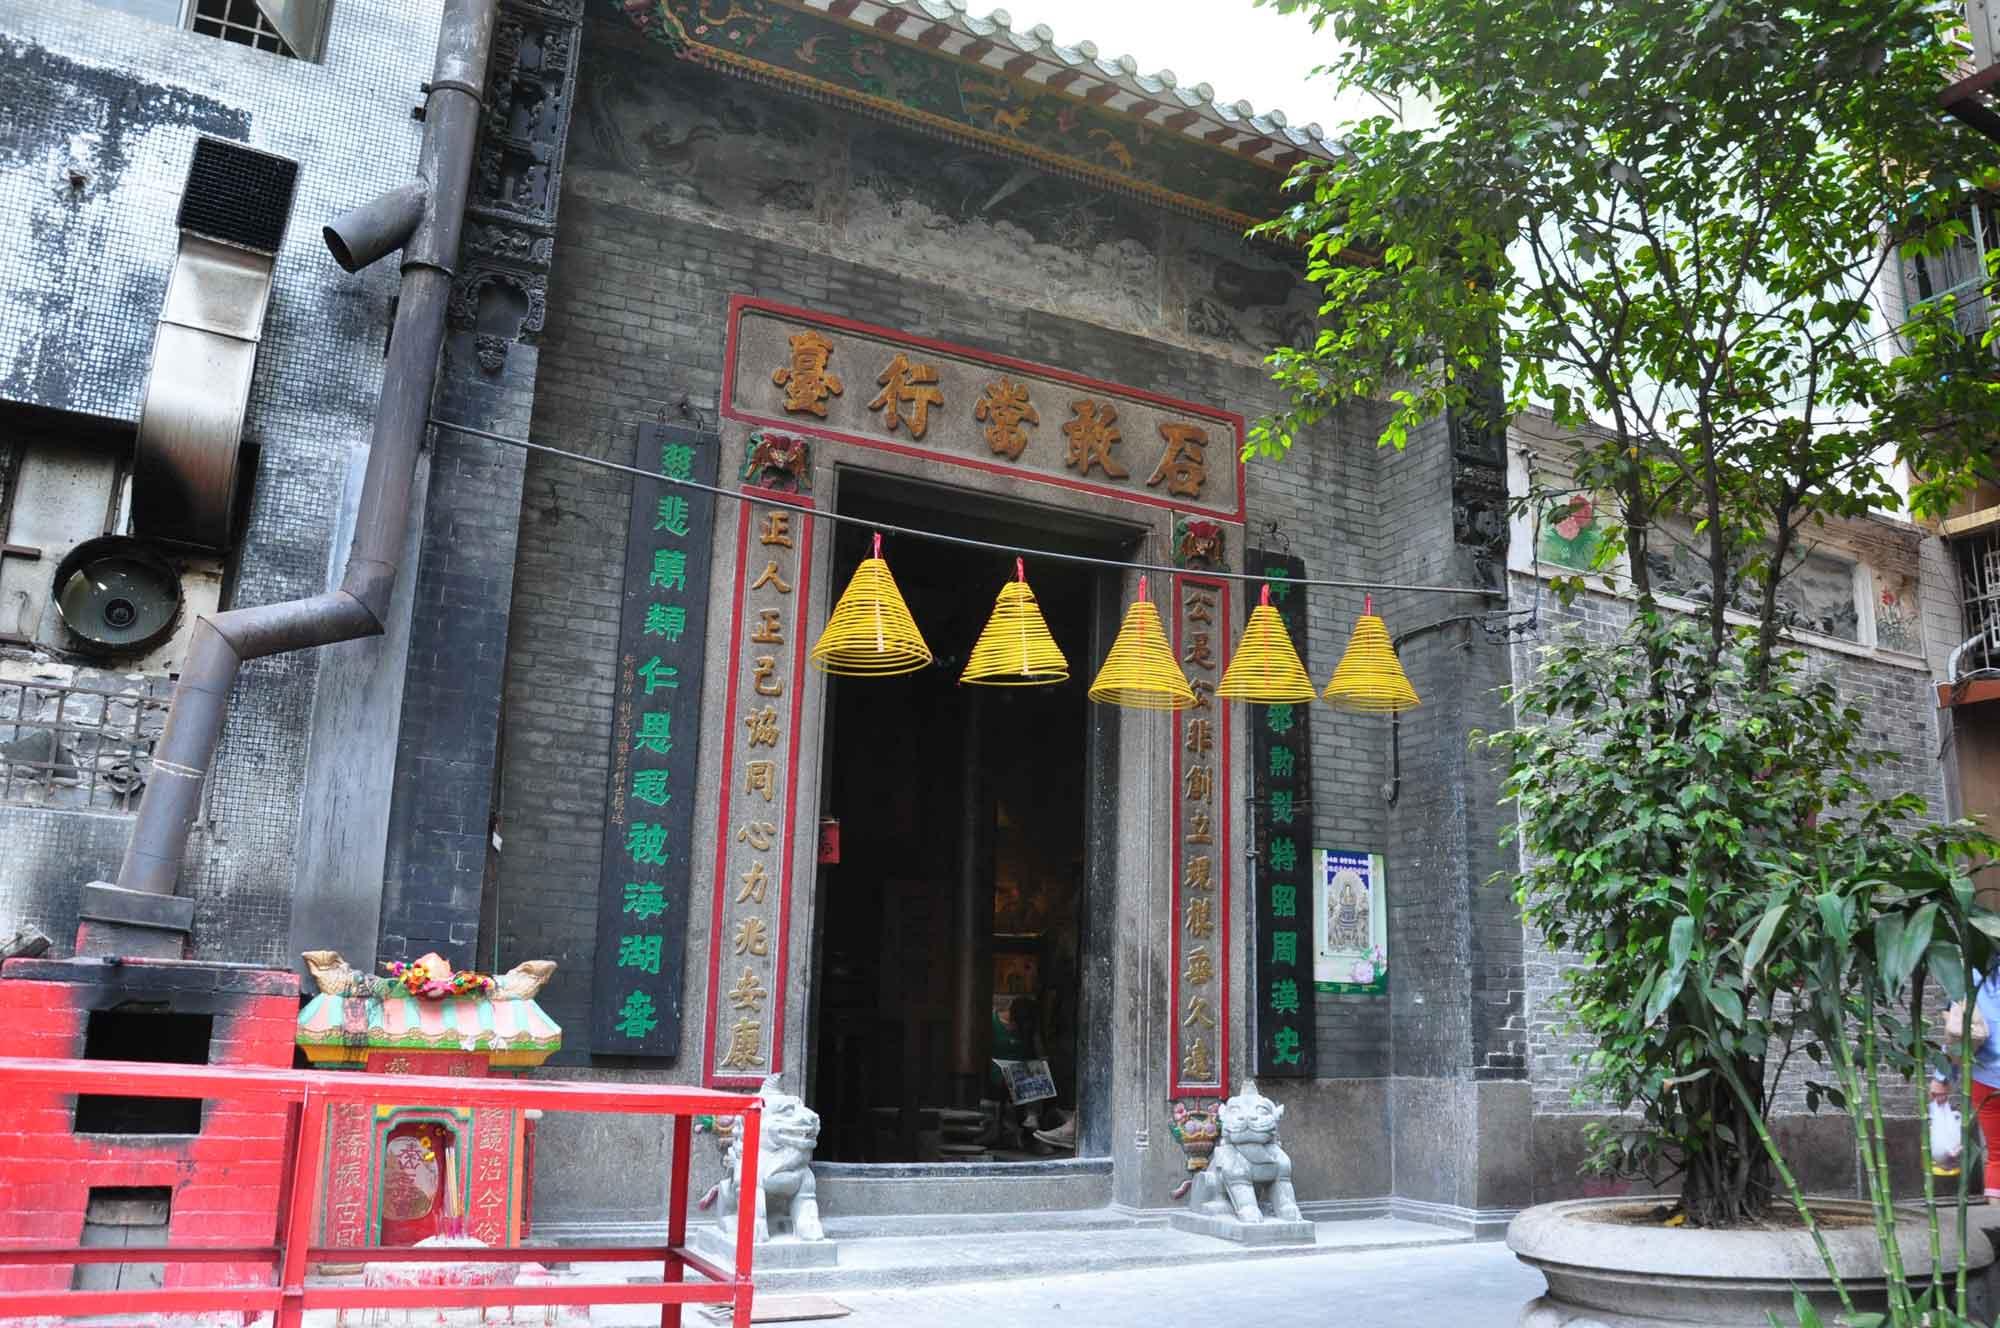 Macau Camoes Park Temples: Shi Gan Dang Temple